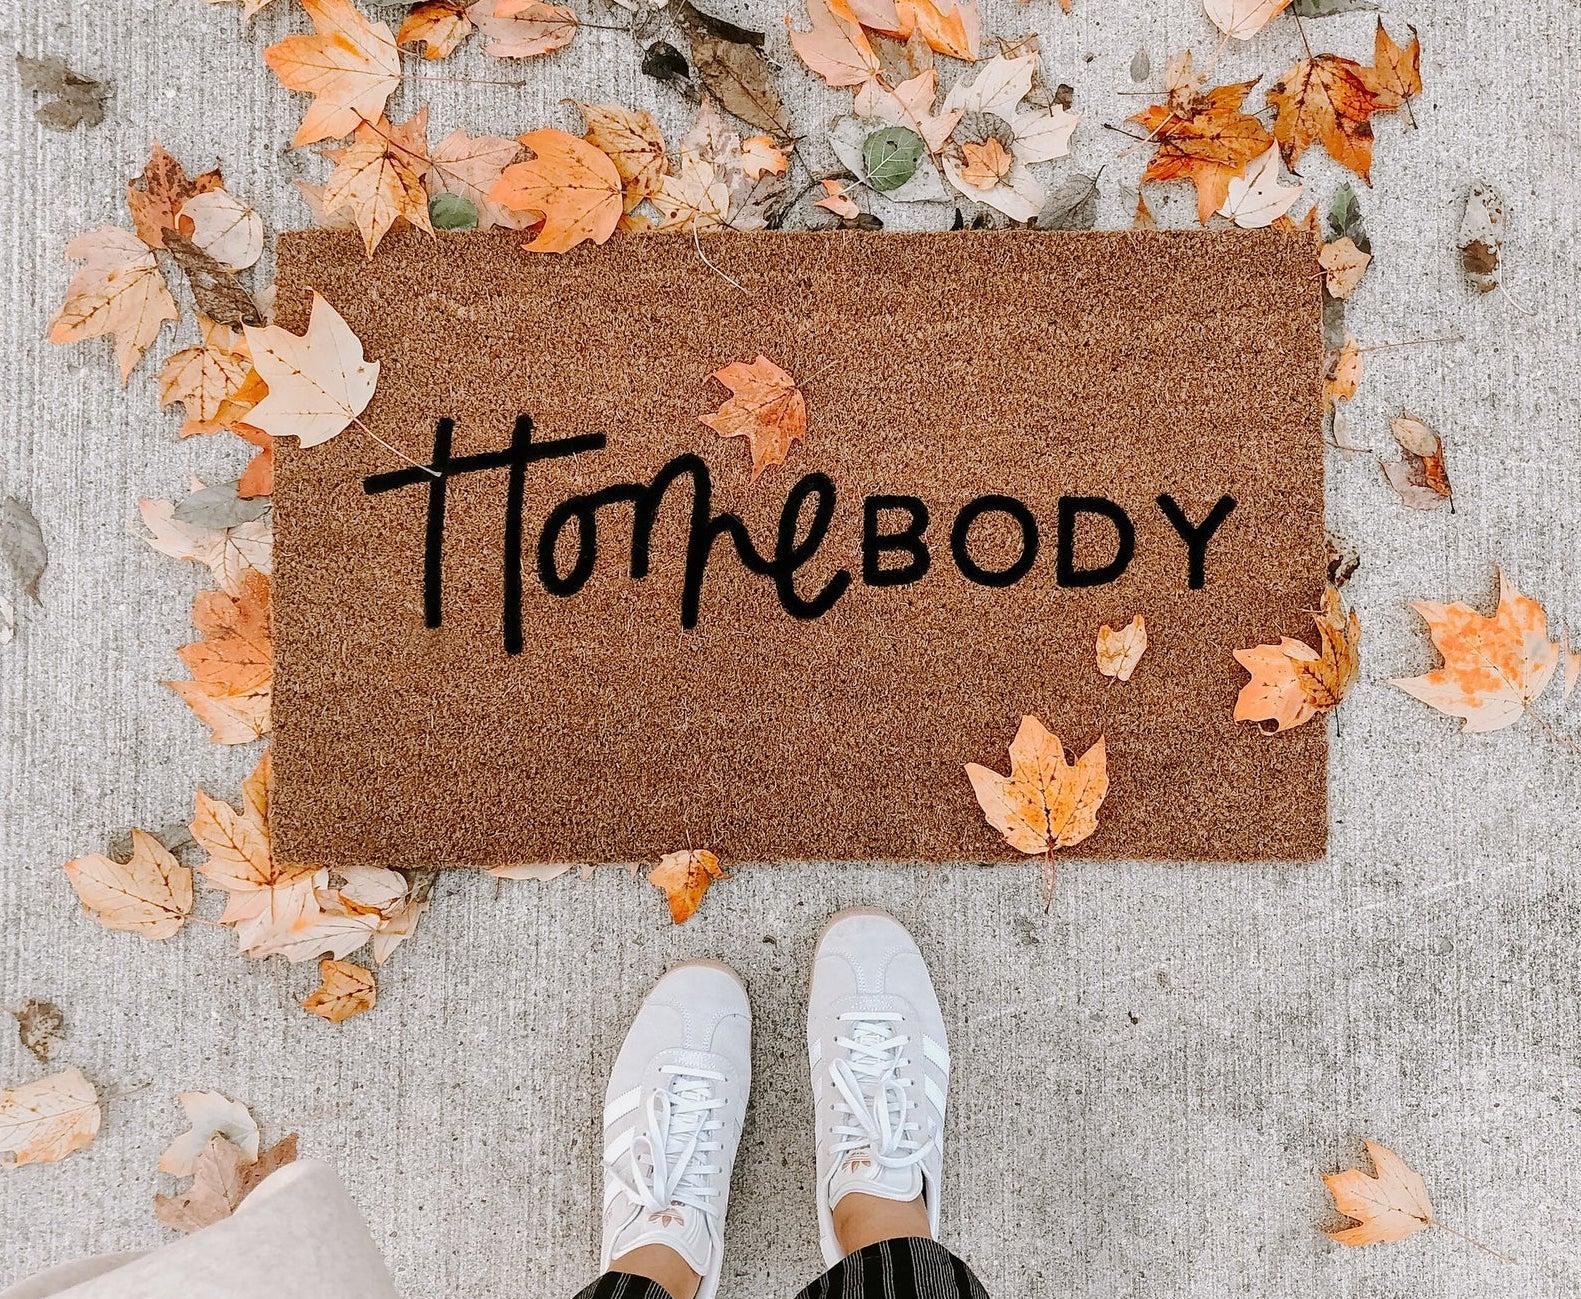 Homebody.jpg